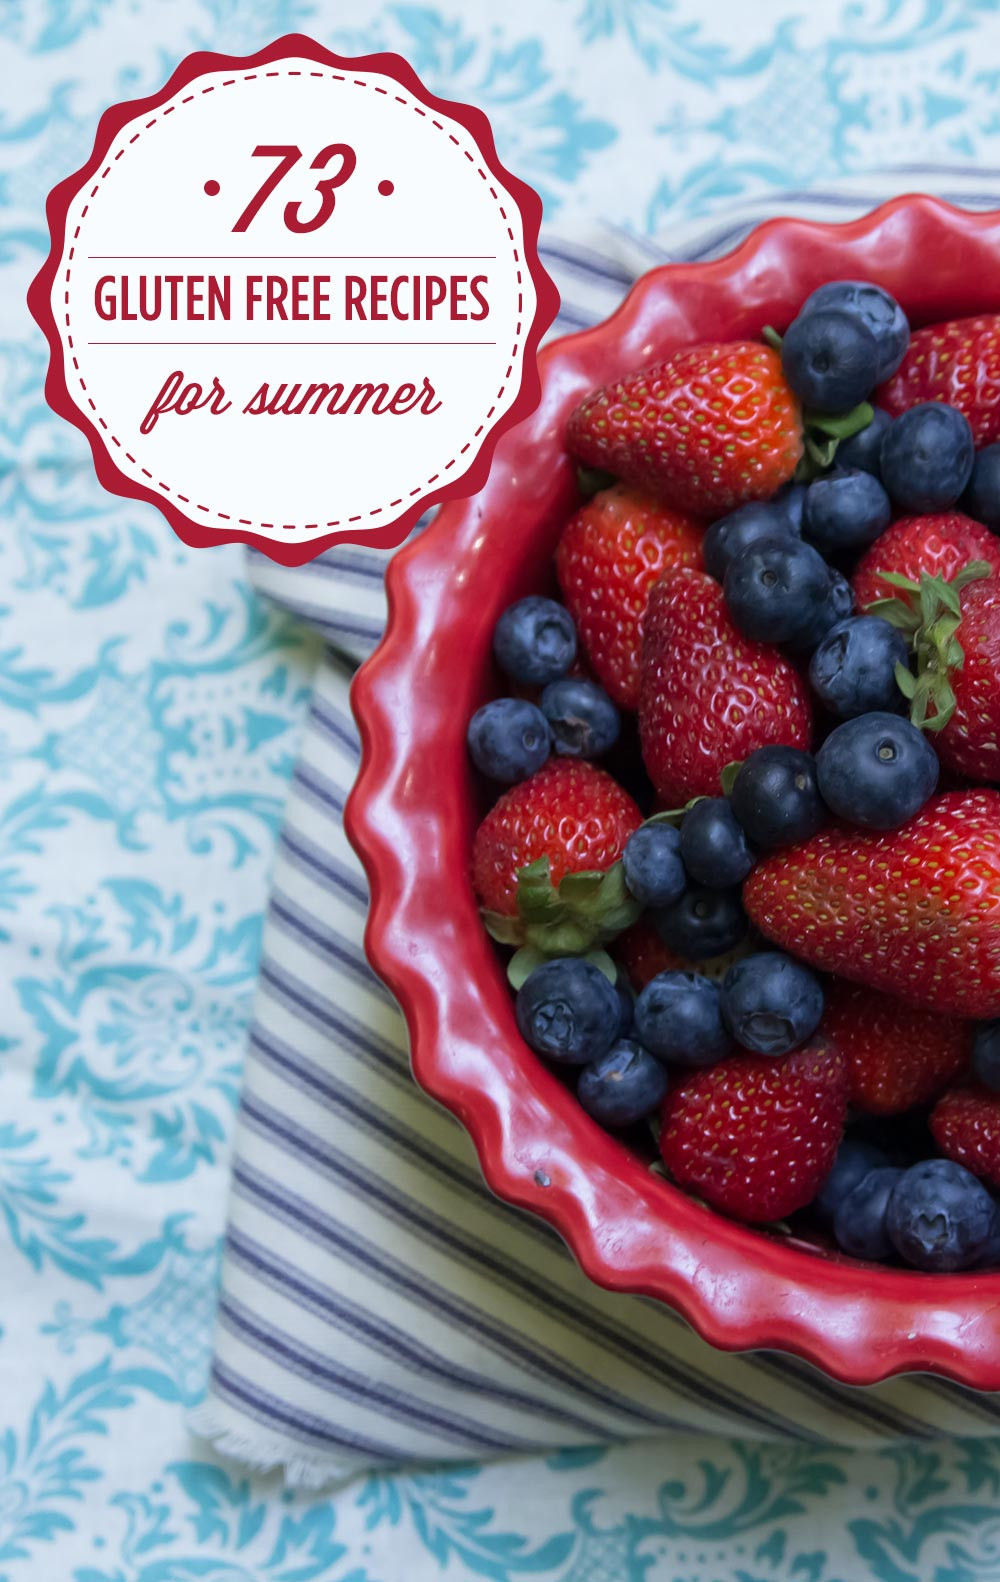 Gluten Free Summer Recipes  73 Gluten Free Recipes for Summer The Tomato Tart